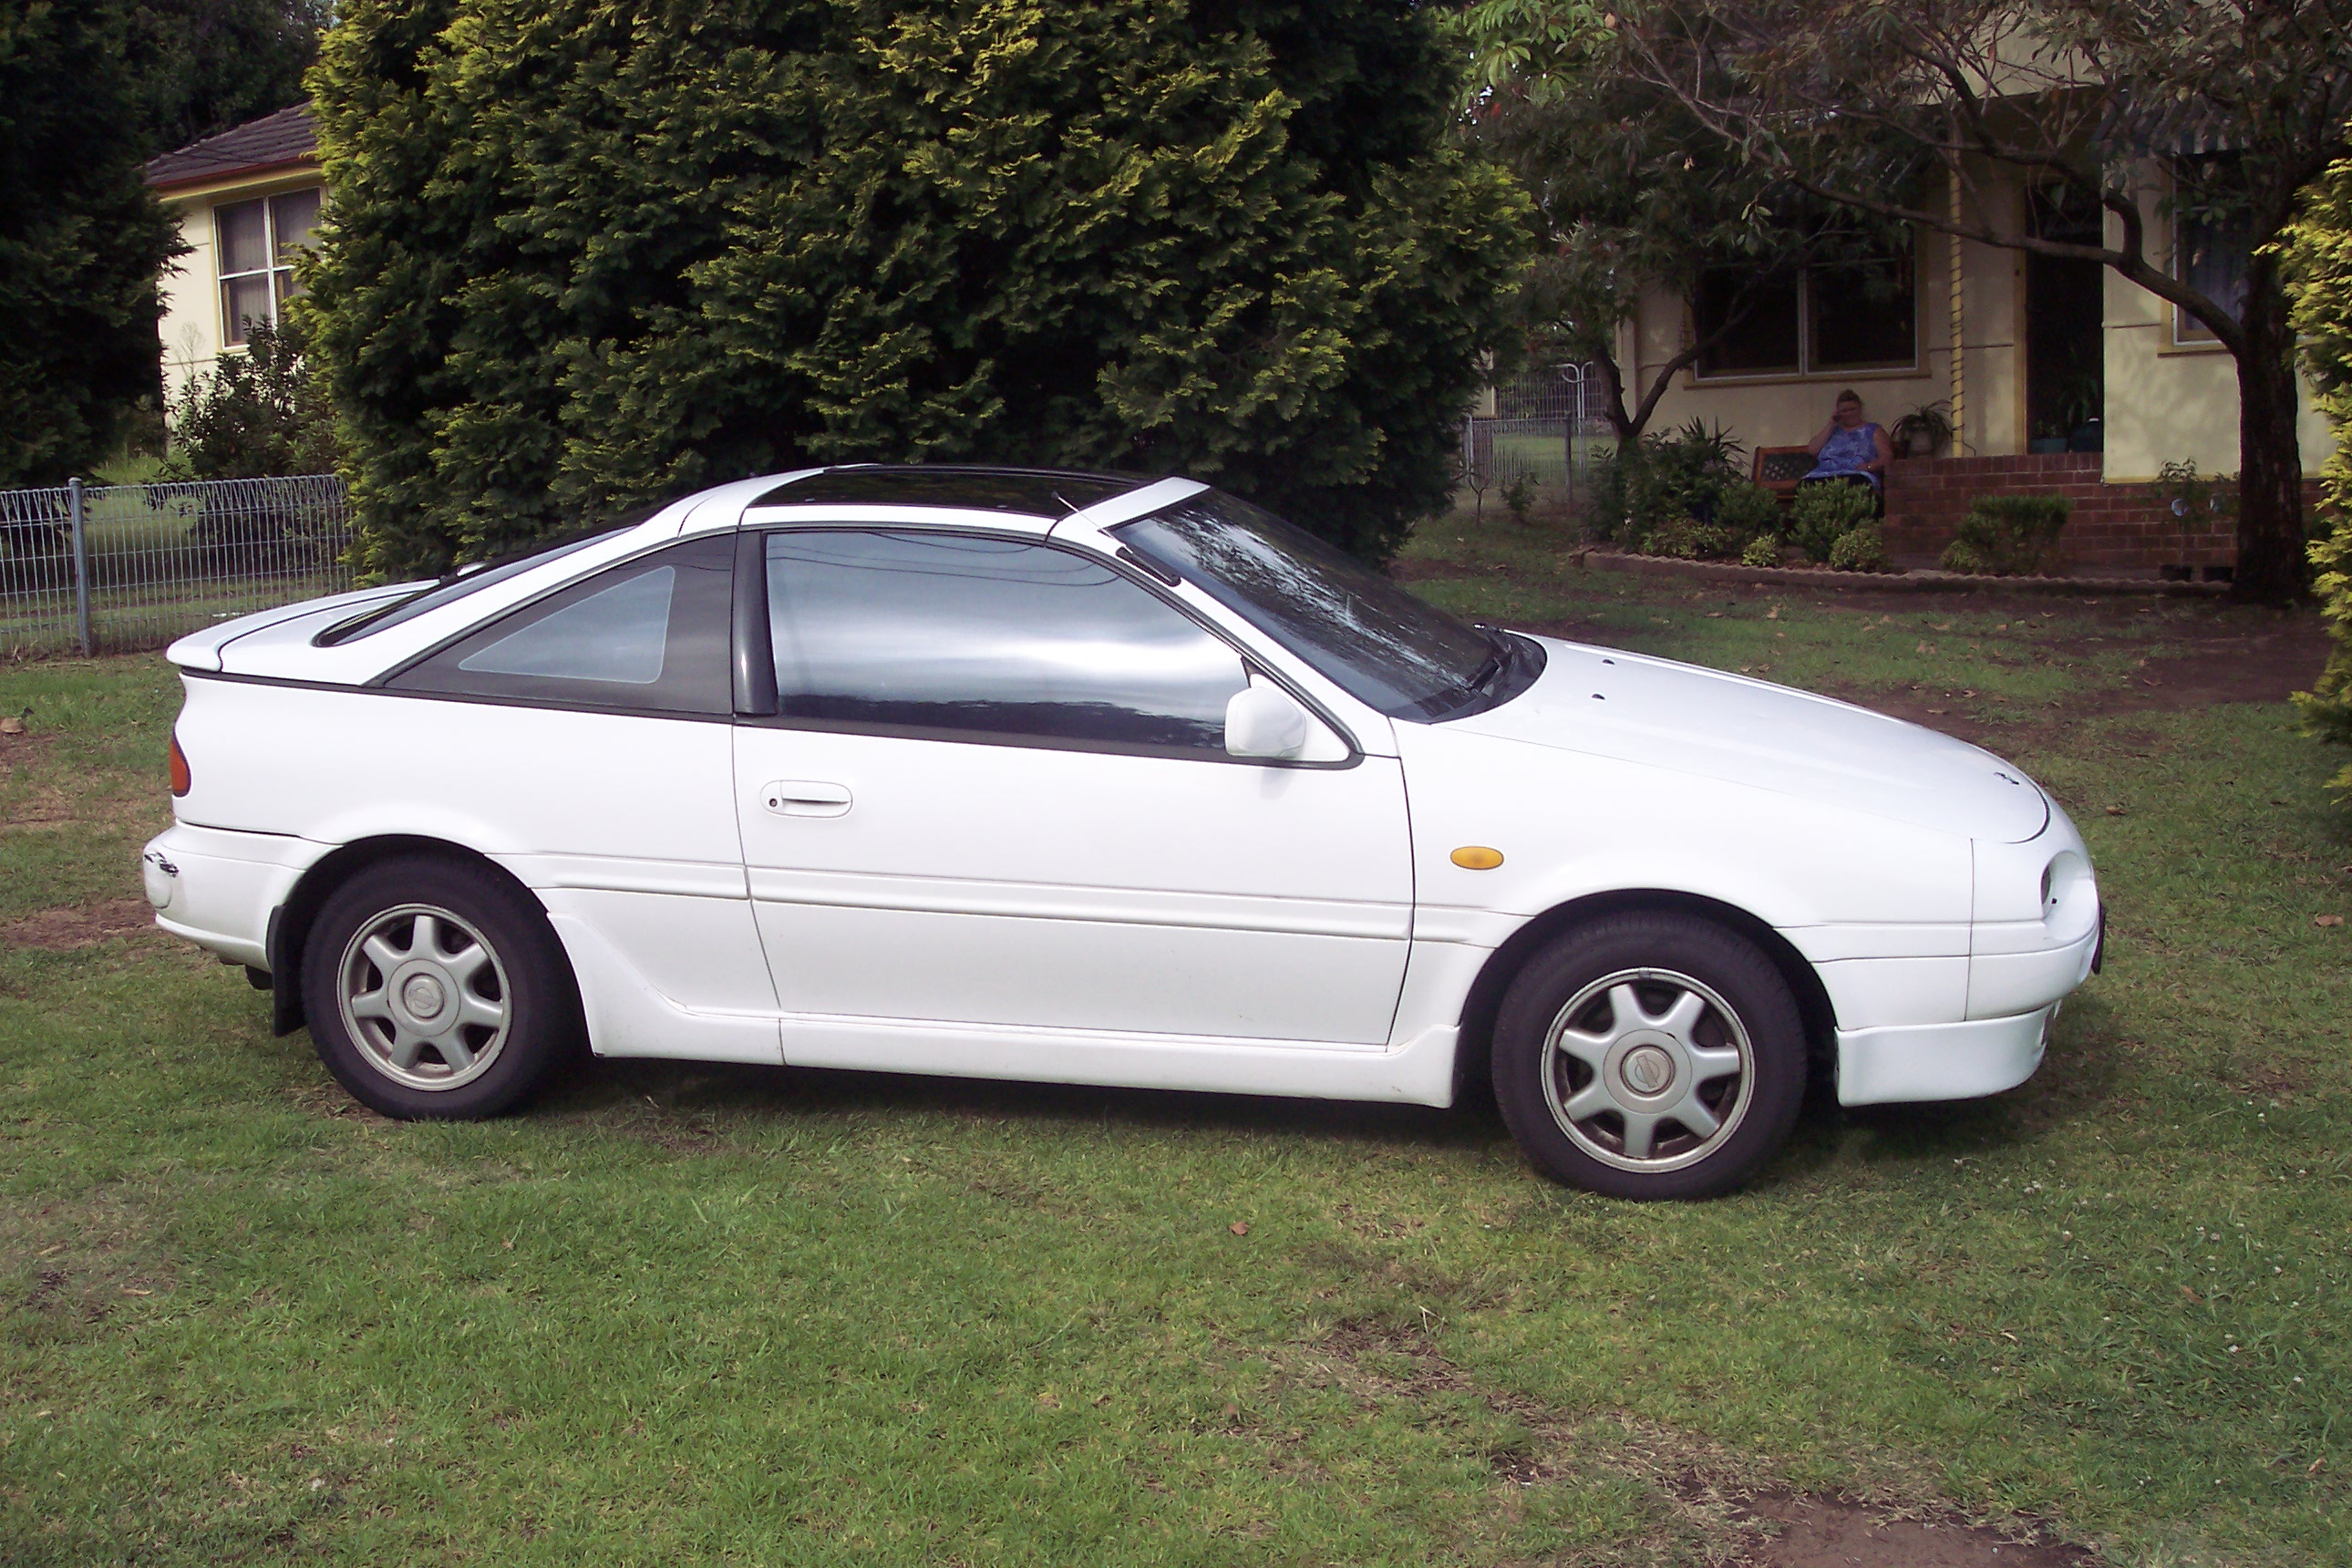 1993 Nissan Nx2000 Nissan nx Coupé 1993